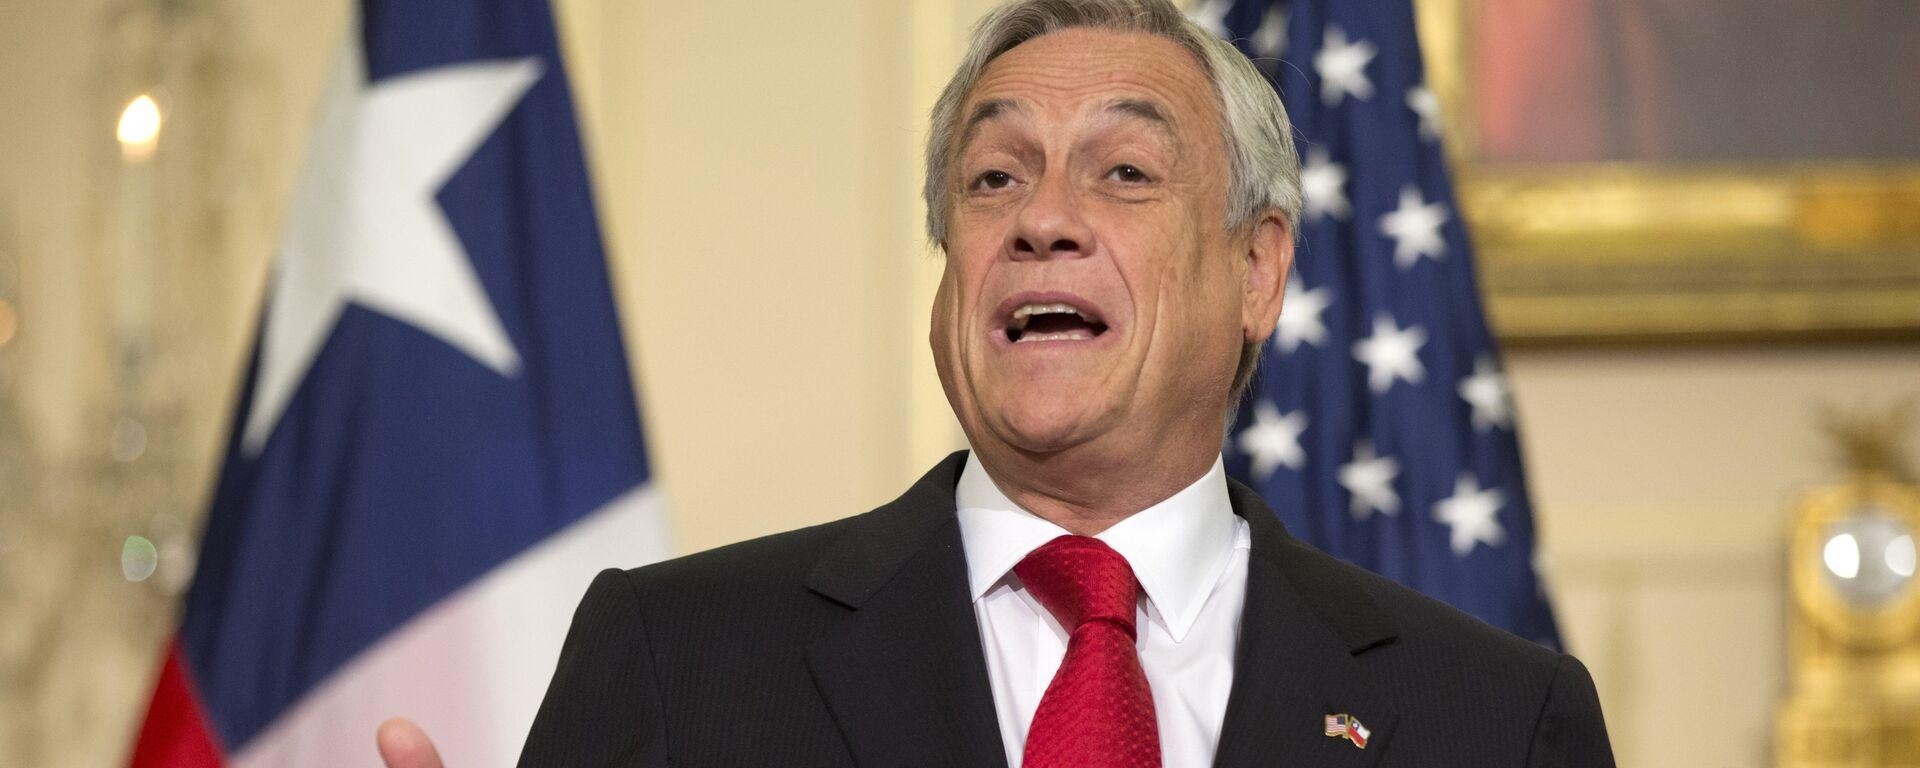 Sebastián Piñera, candidato a la presidencia y exmandatario (2010-2014) chileno - Sputnik Mundo, 1920, 04.09.2021